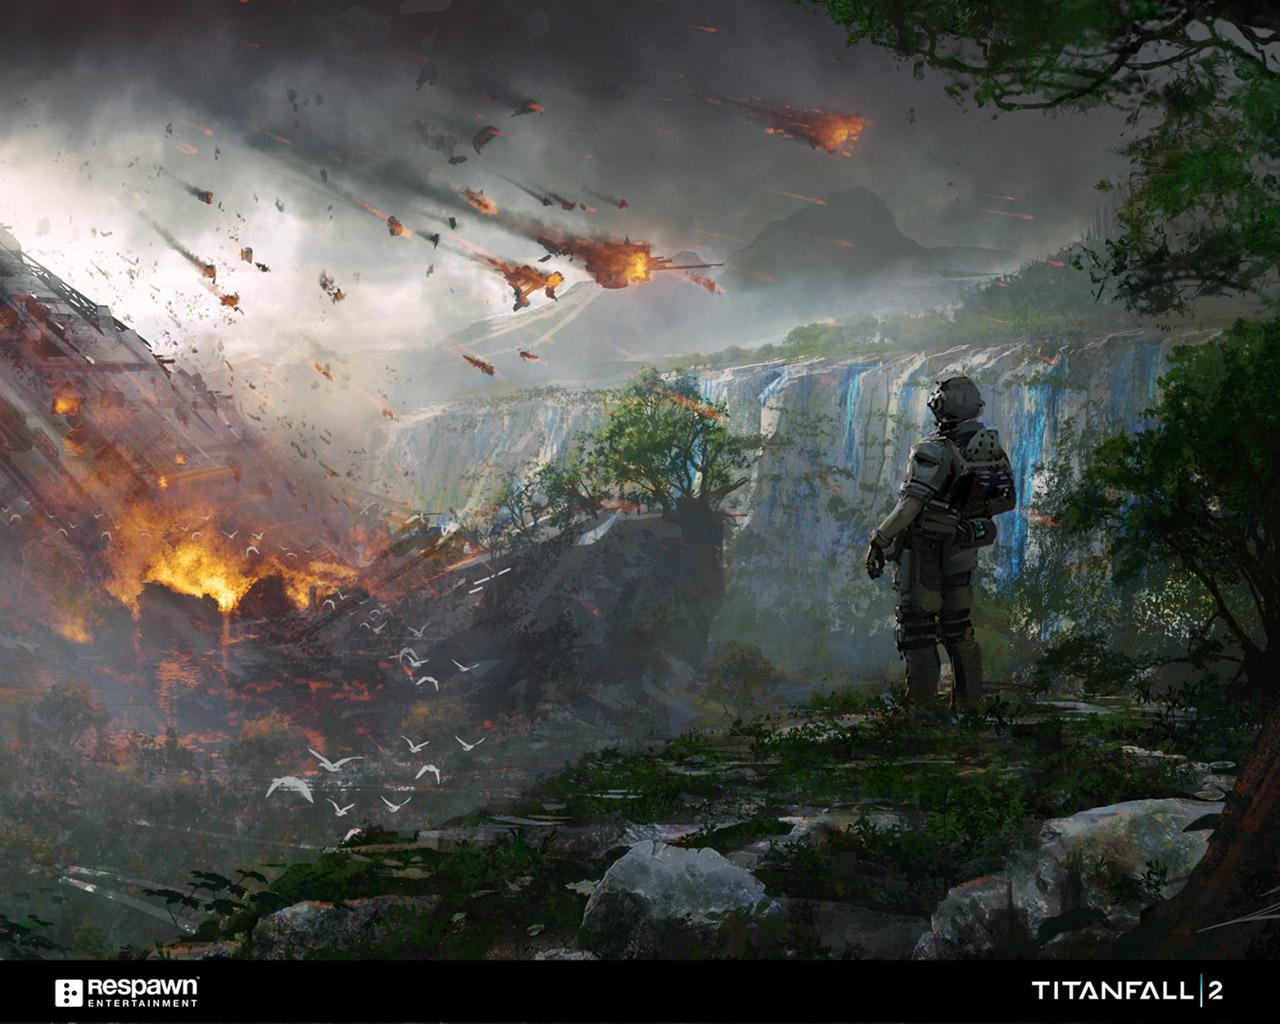 Free Titanfall 2 Wallpaper in 1280x1024